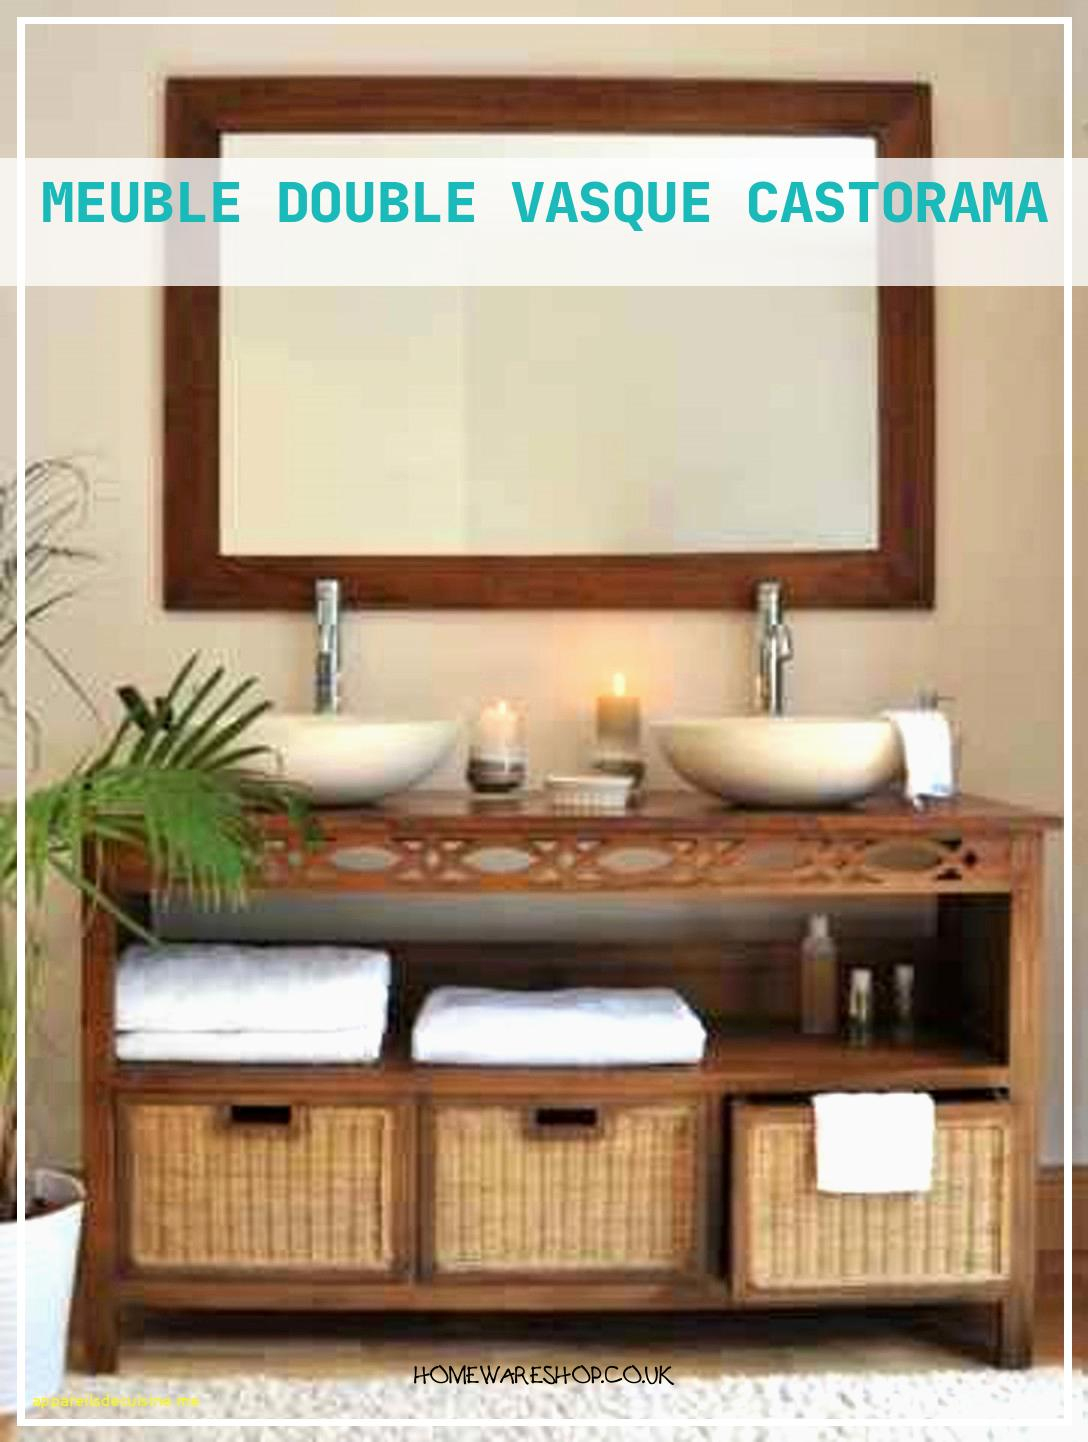 Stupefiant Meuble Double Vasque Castorama Homewareshop Destine Meuble Salle De Bain Leroy Merlin Promo Agencecormierdelauniere Com Agencecormierdelauniere Com